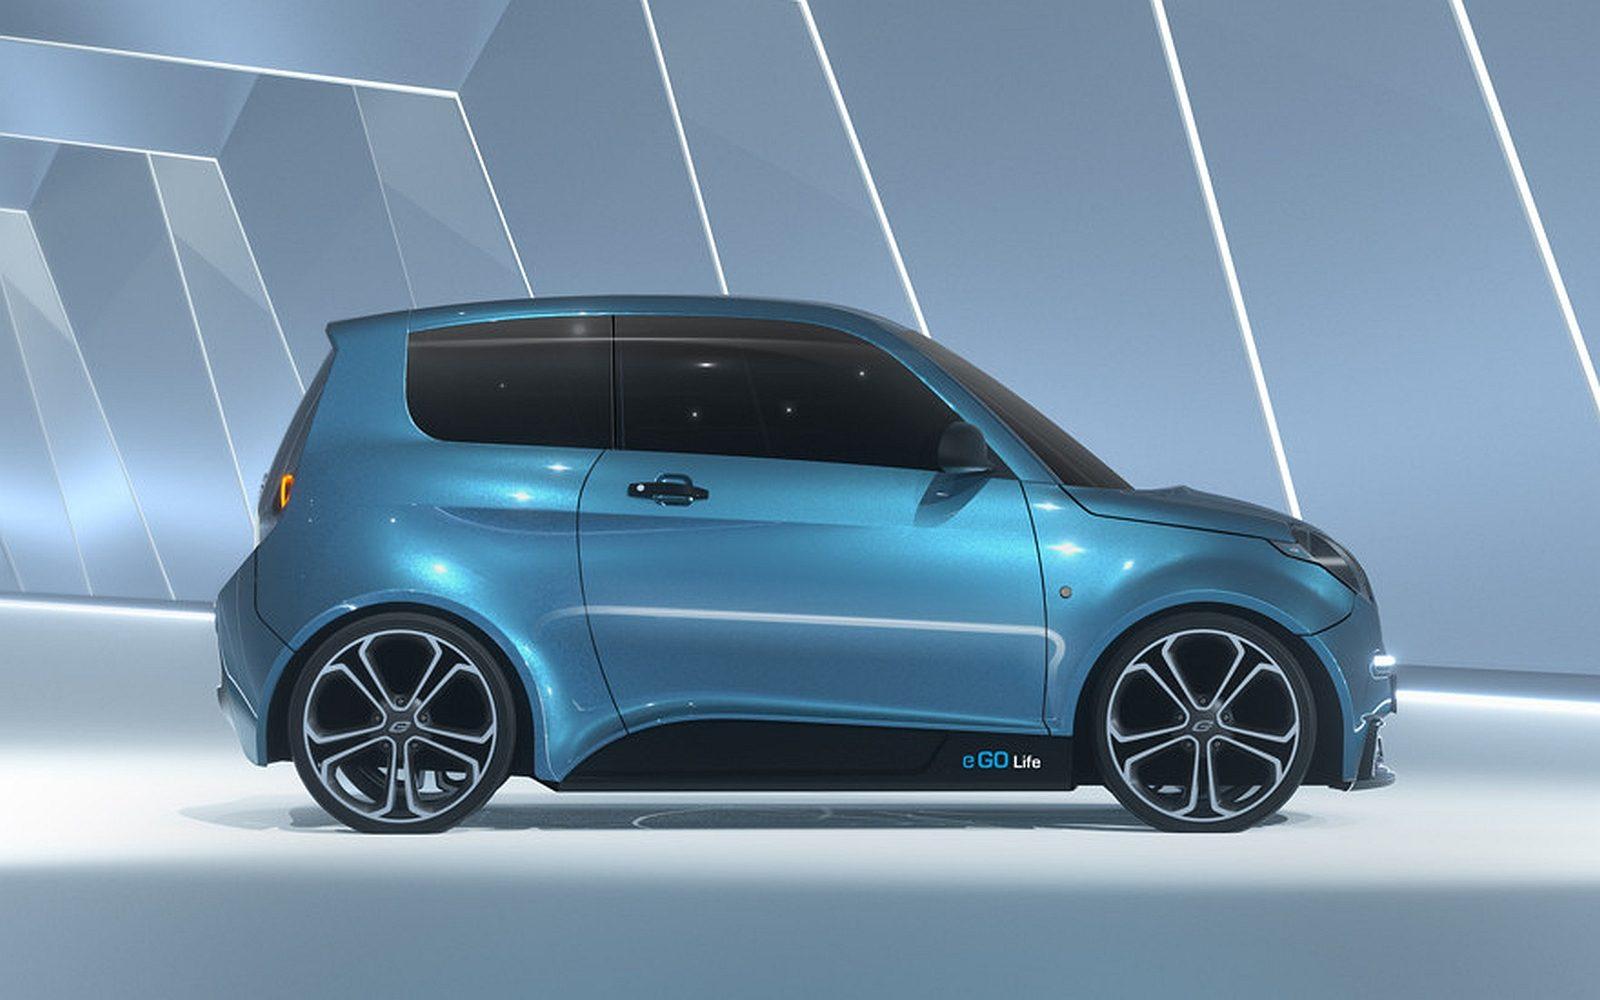 Goedkoopste elektrische auto, de e.GO!